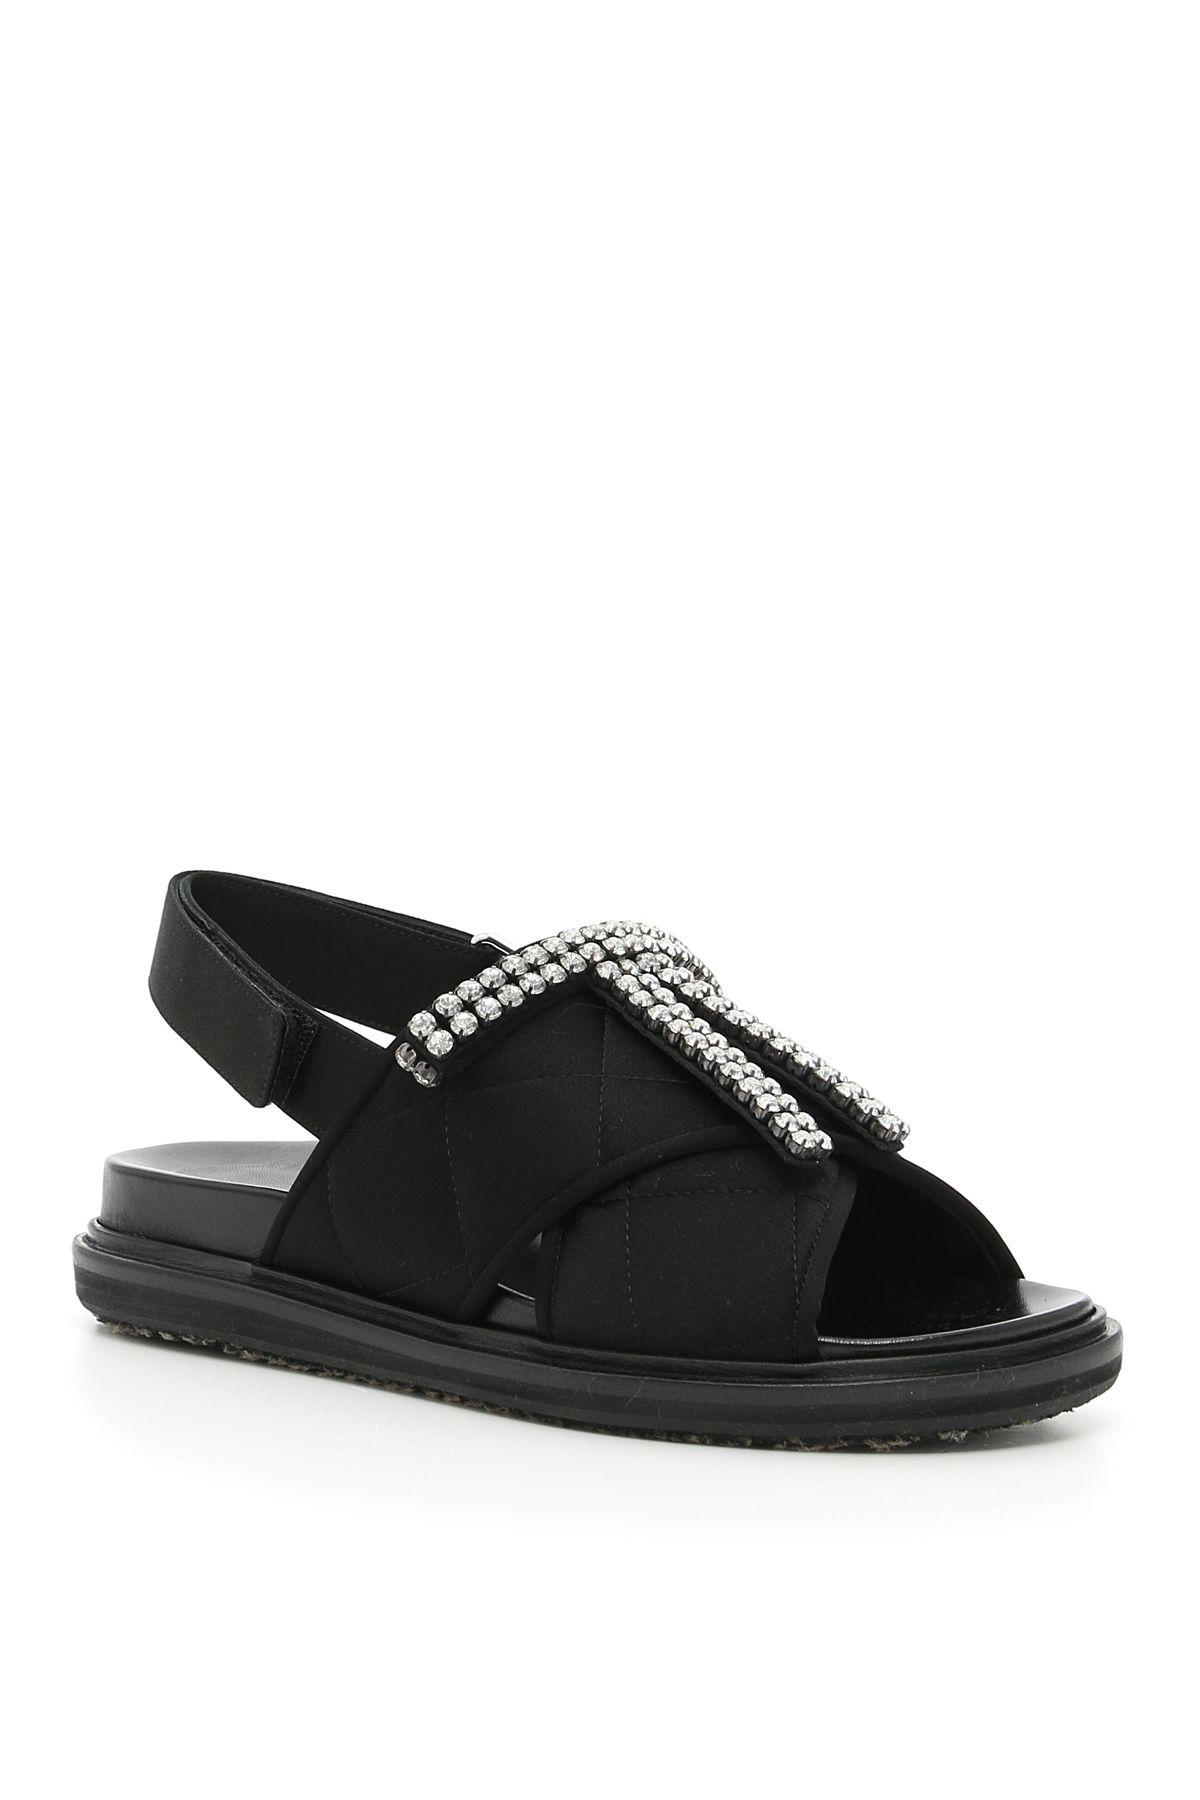 Fusbett Sandals